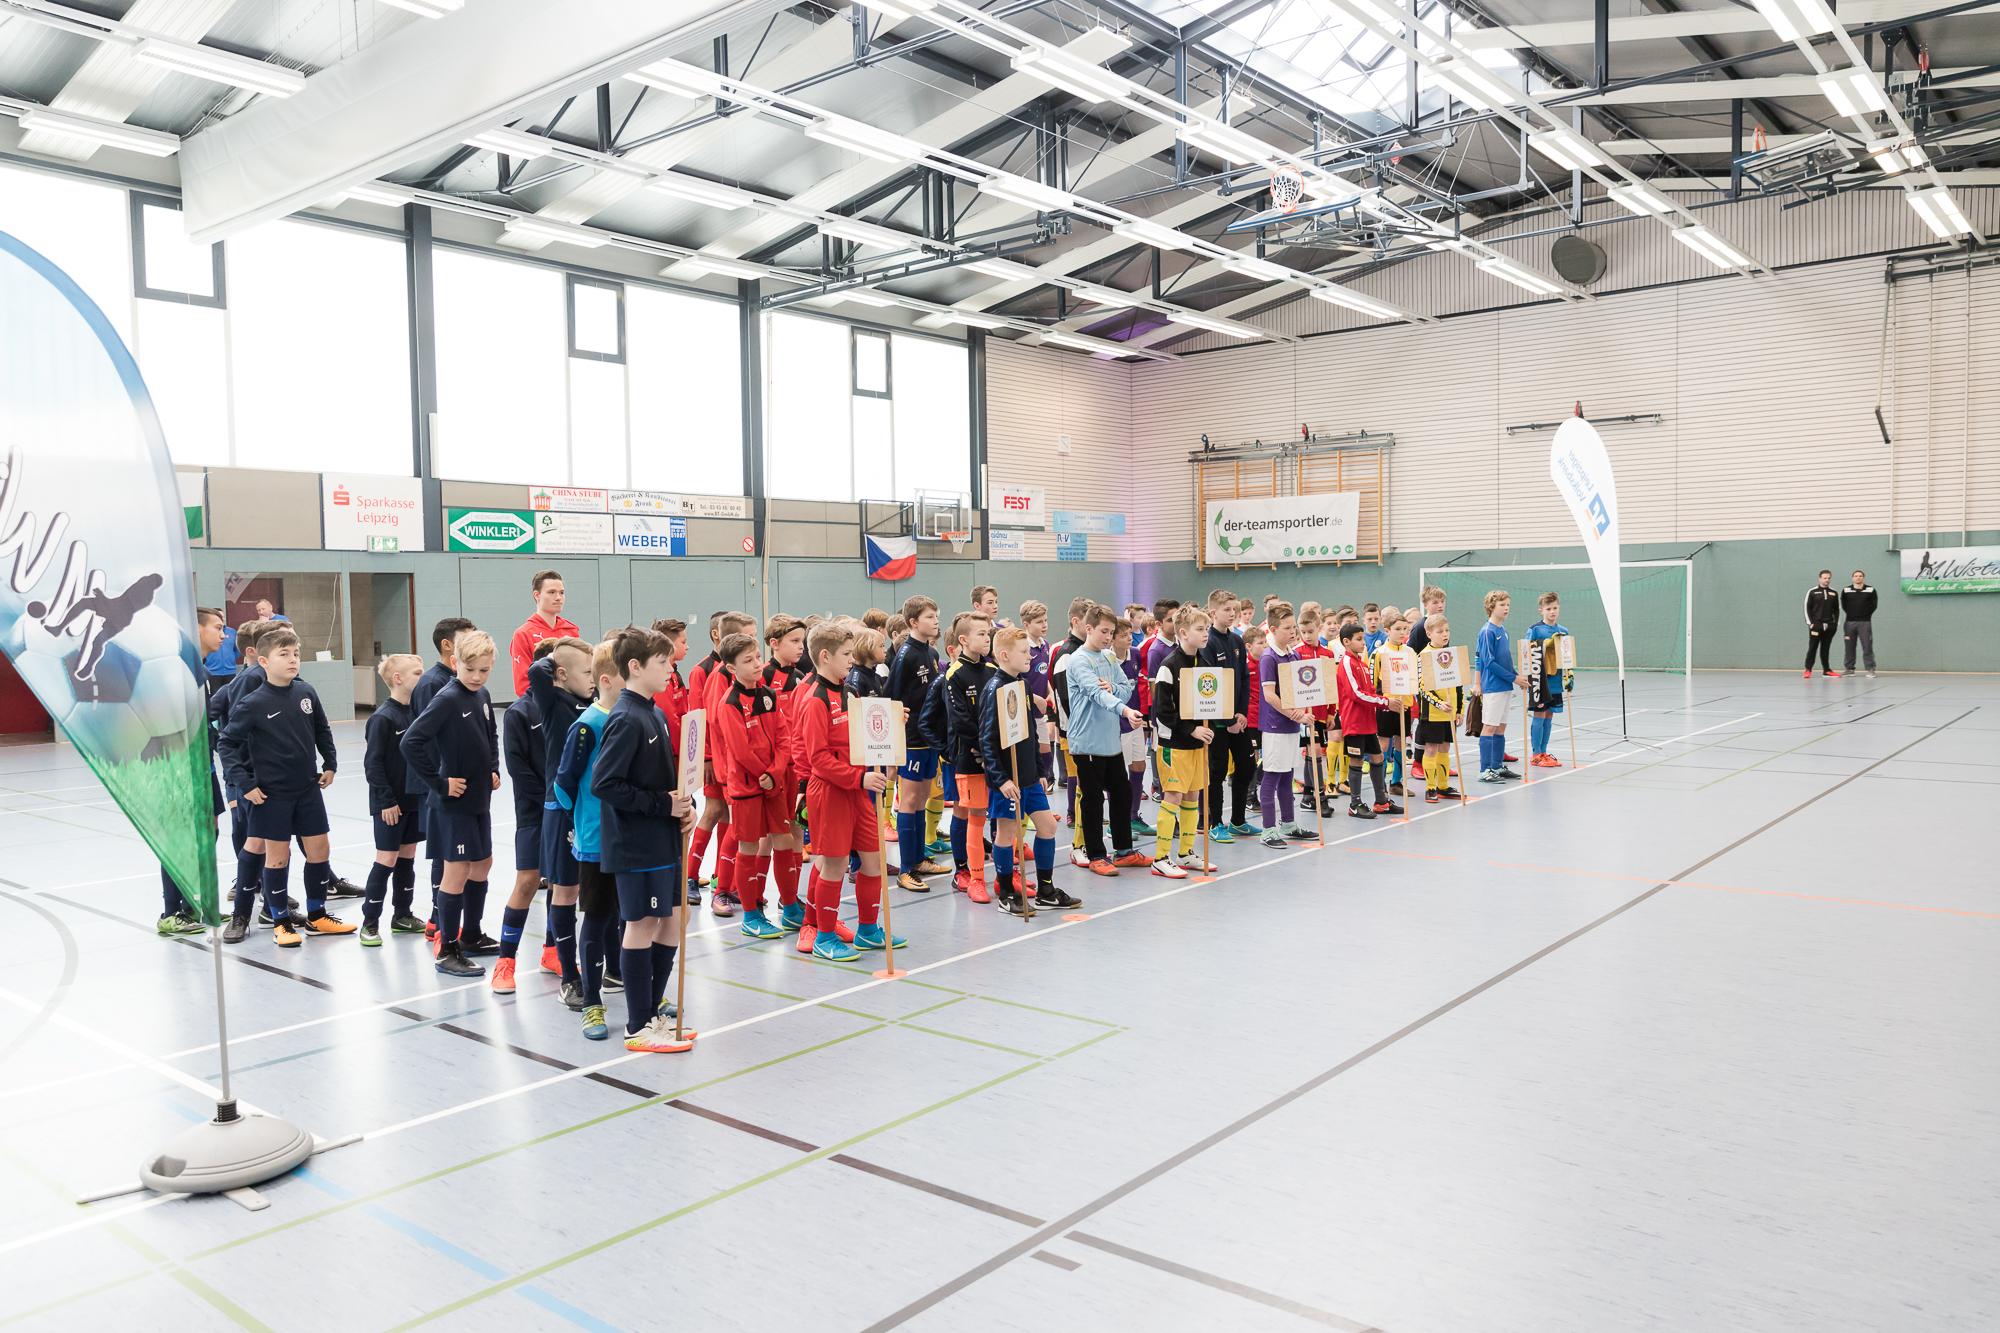 Eröffnung 2. Internationaler Hallencup U12 in Frohburg 240218